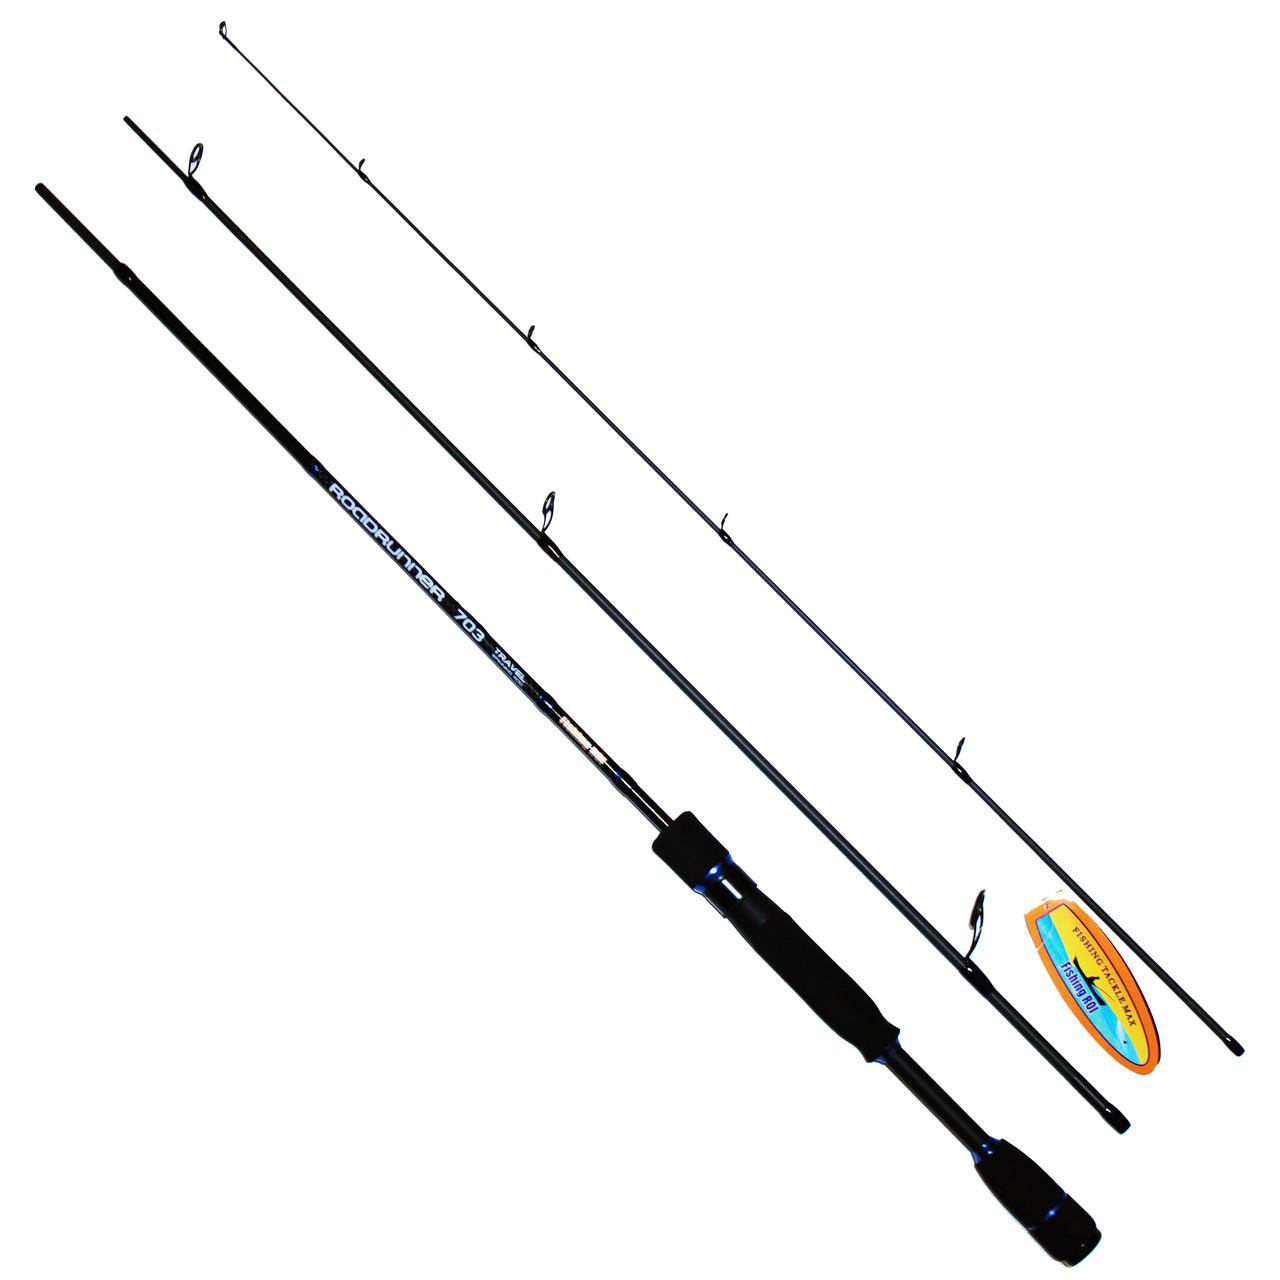 Спиннинг Fishing ROI Roadrunner 703 2.1 м. (тест 5-20 г.)